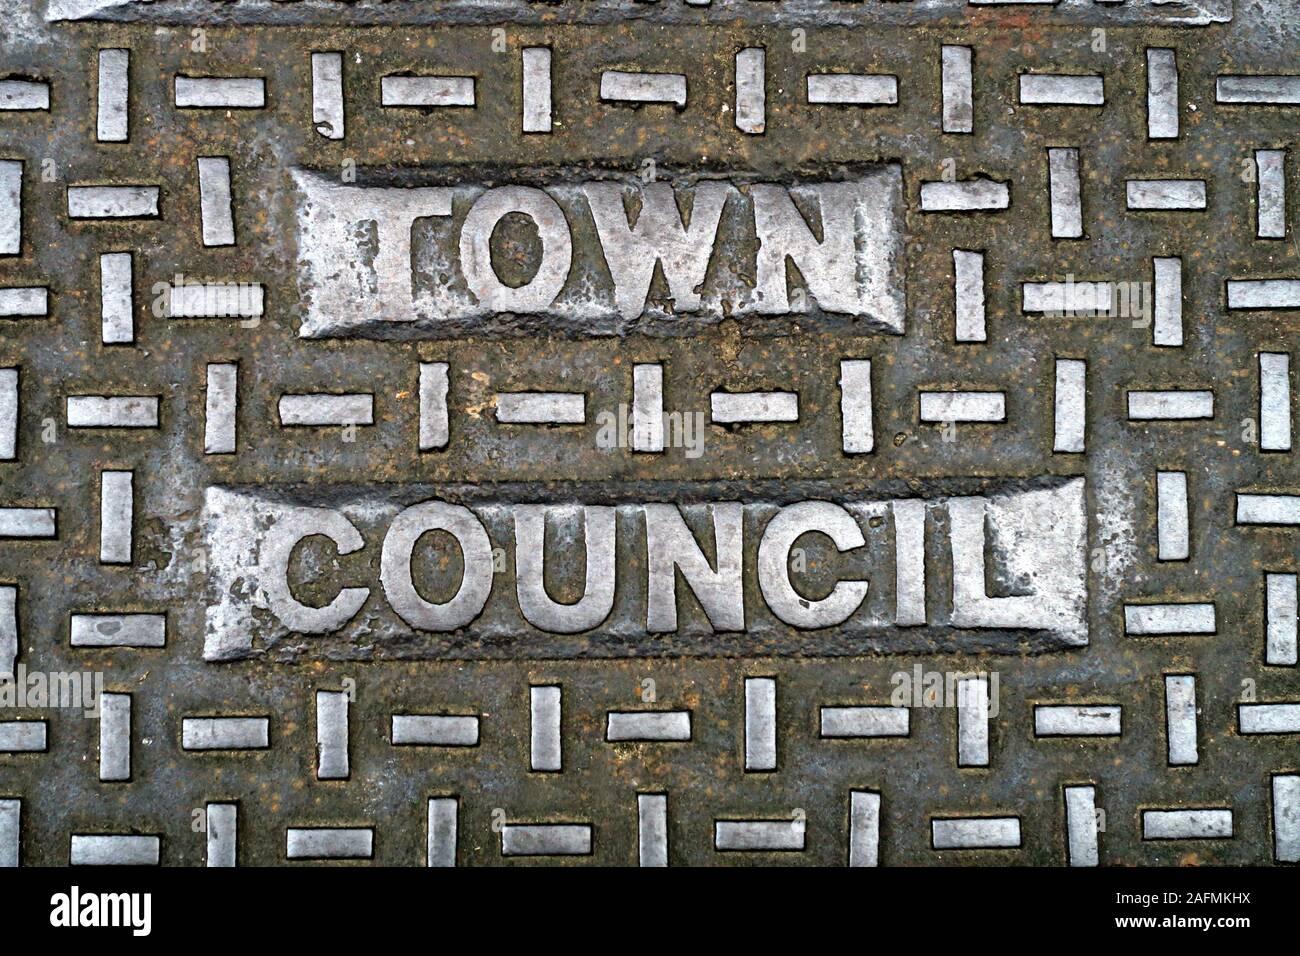 HotpixUK,@HotpixUK,GoTonySmith,SDC,Sedgemoor,South West England,England,UK,South West,town,grid,grids,manhole,cover,Bridgwater Town,South West of England,Bridgwater Council ironwork,ironwork,history,historic